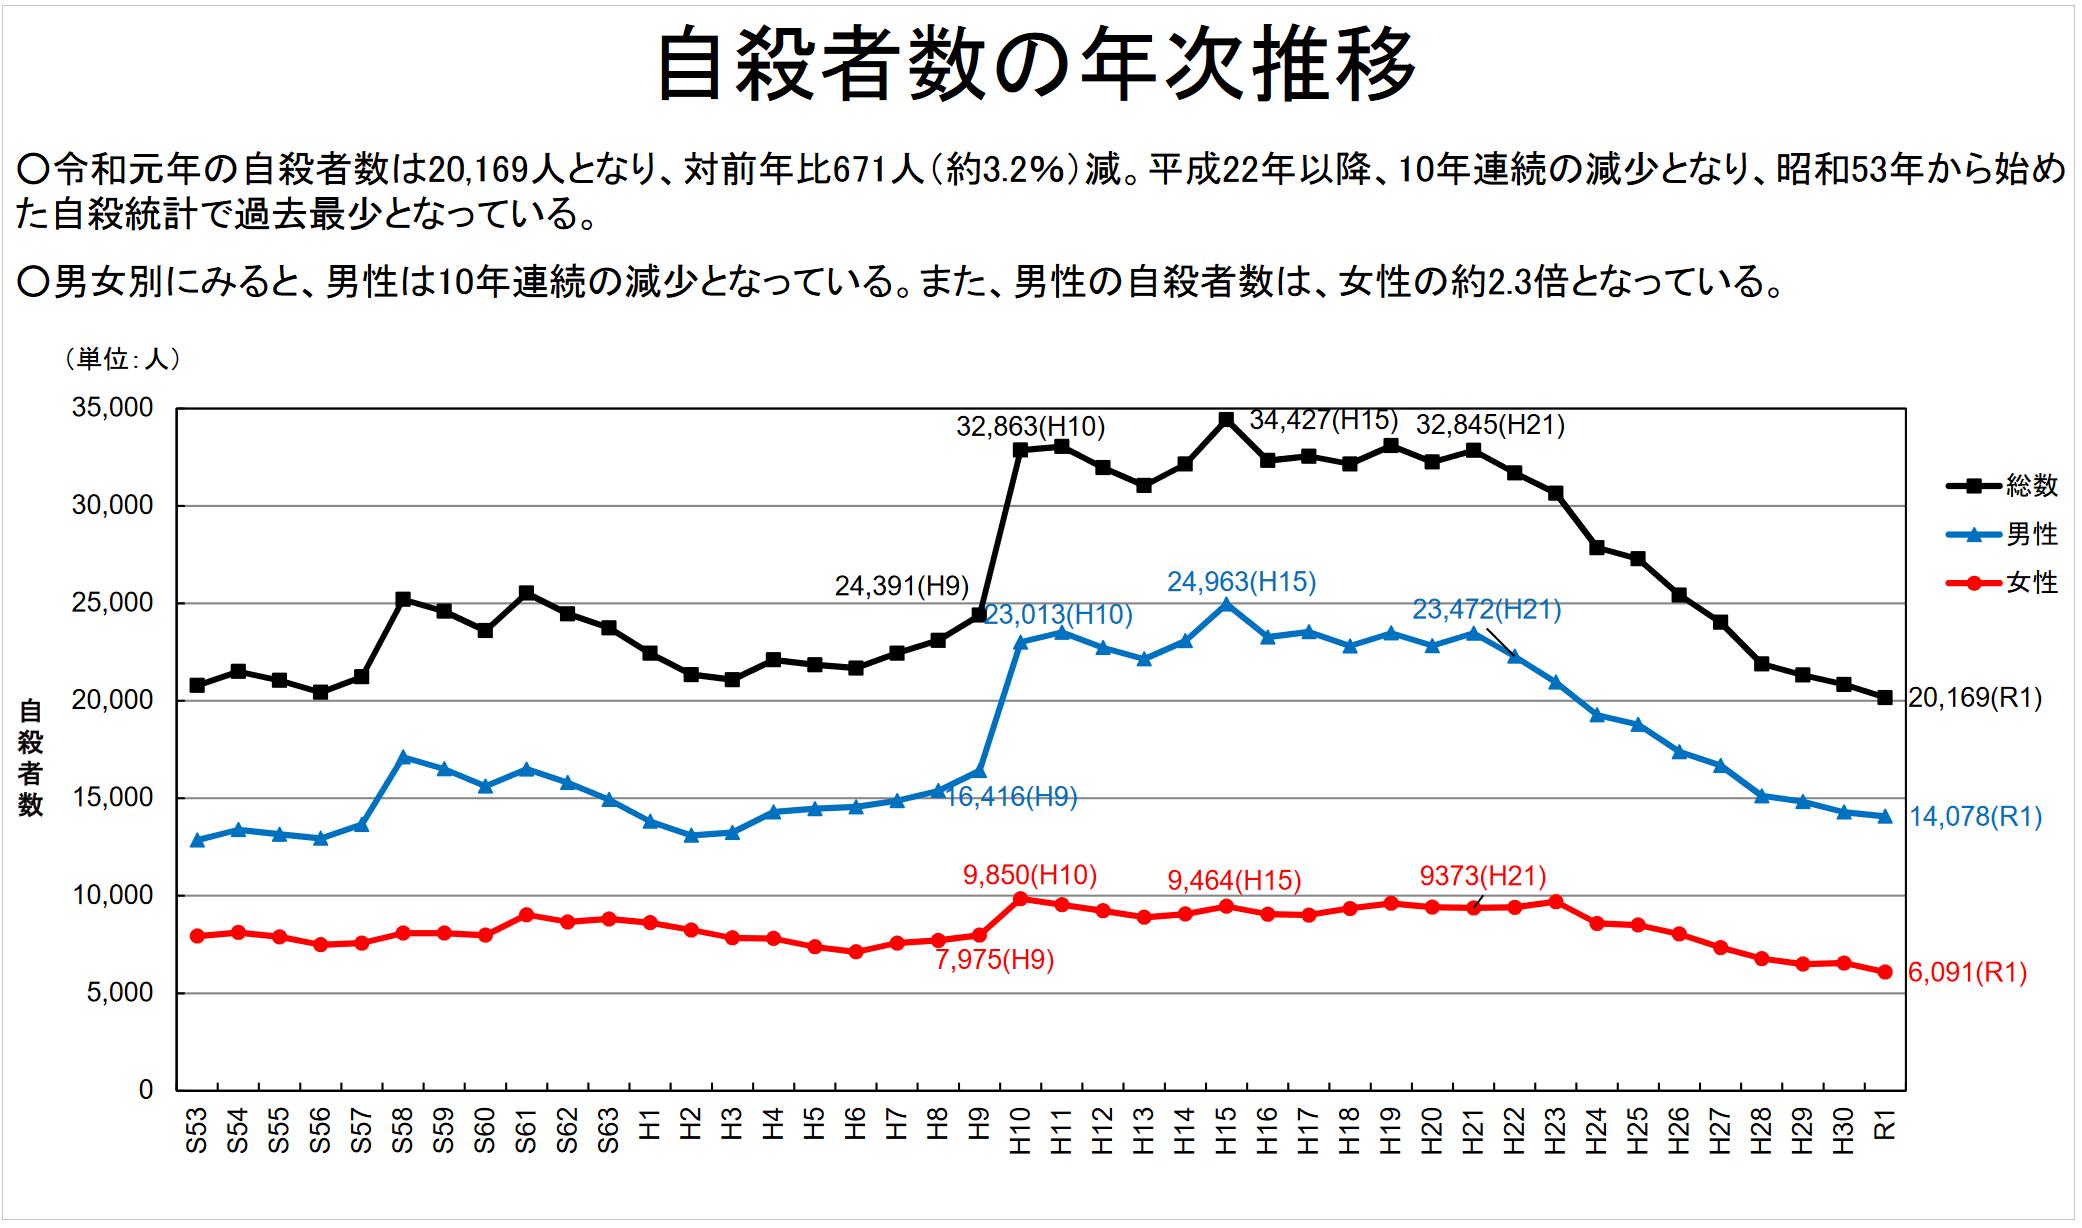 自殺者数の年次推移